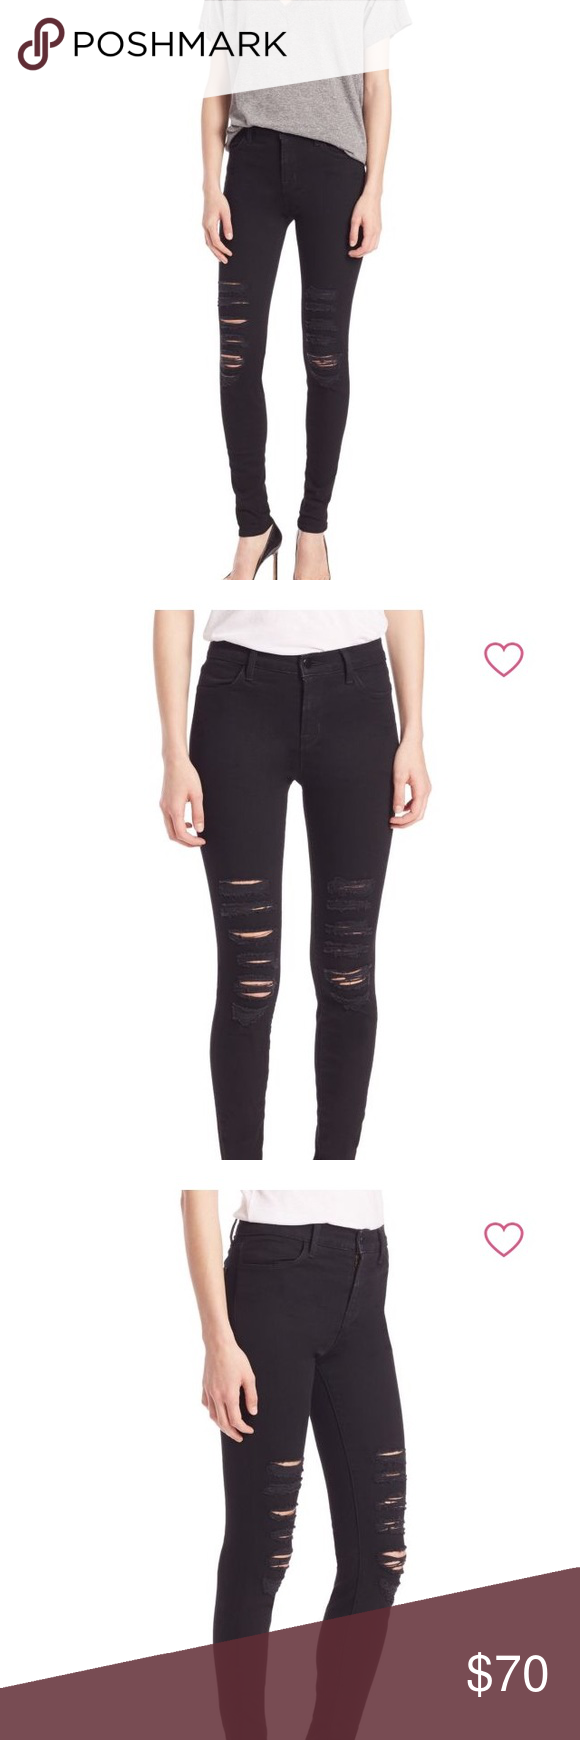 b7af31a651a9 J Brand Maria Black Heart High-Rise Skinny Leg Distressed skinny jean